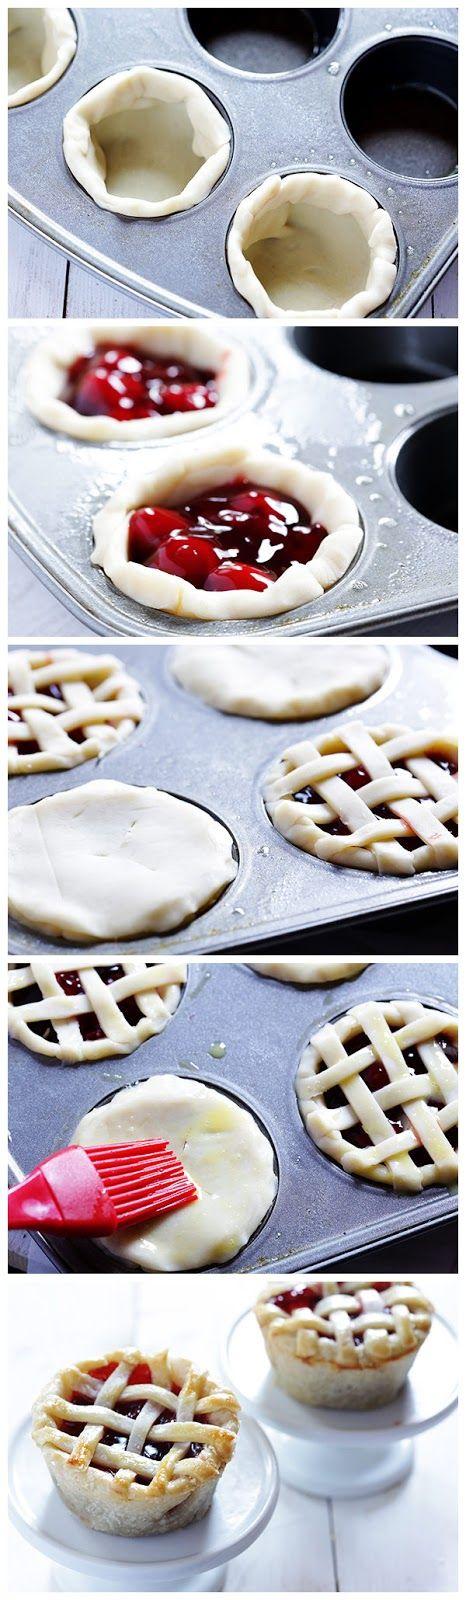 How to Make Mini Pies in a Cupcake Tin - toprecipeblog